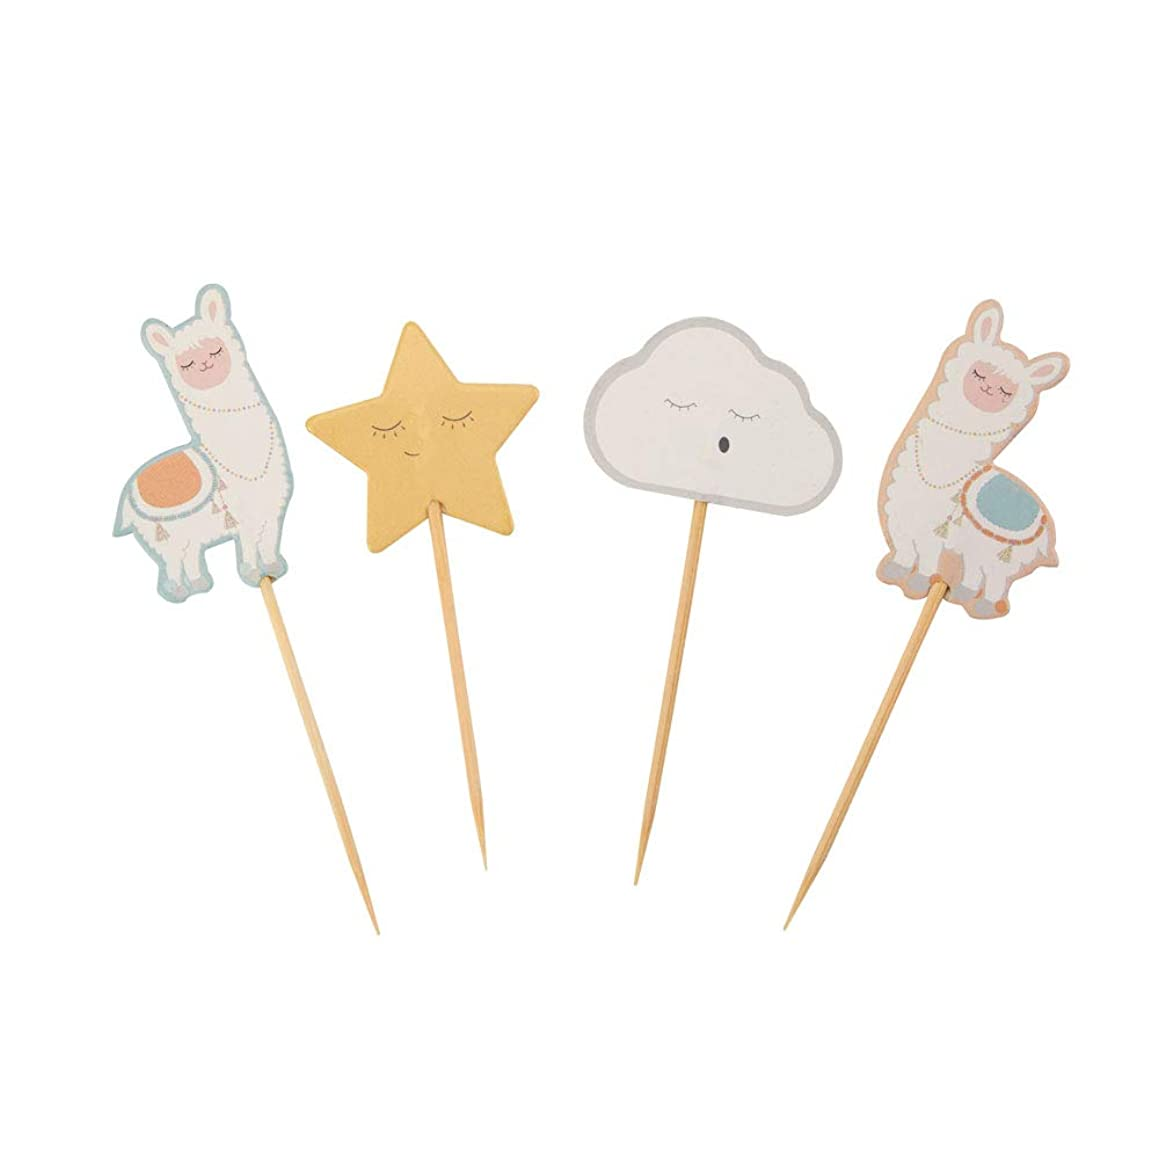 Neviti 776339 Llama Love-Cupcake Picks-20 Pack Cake Picks, Pastel Multi, 7 x 2.5 x 6.5